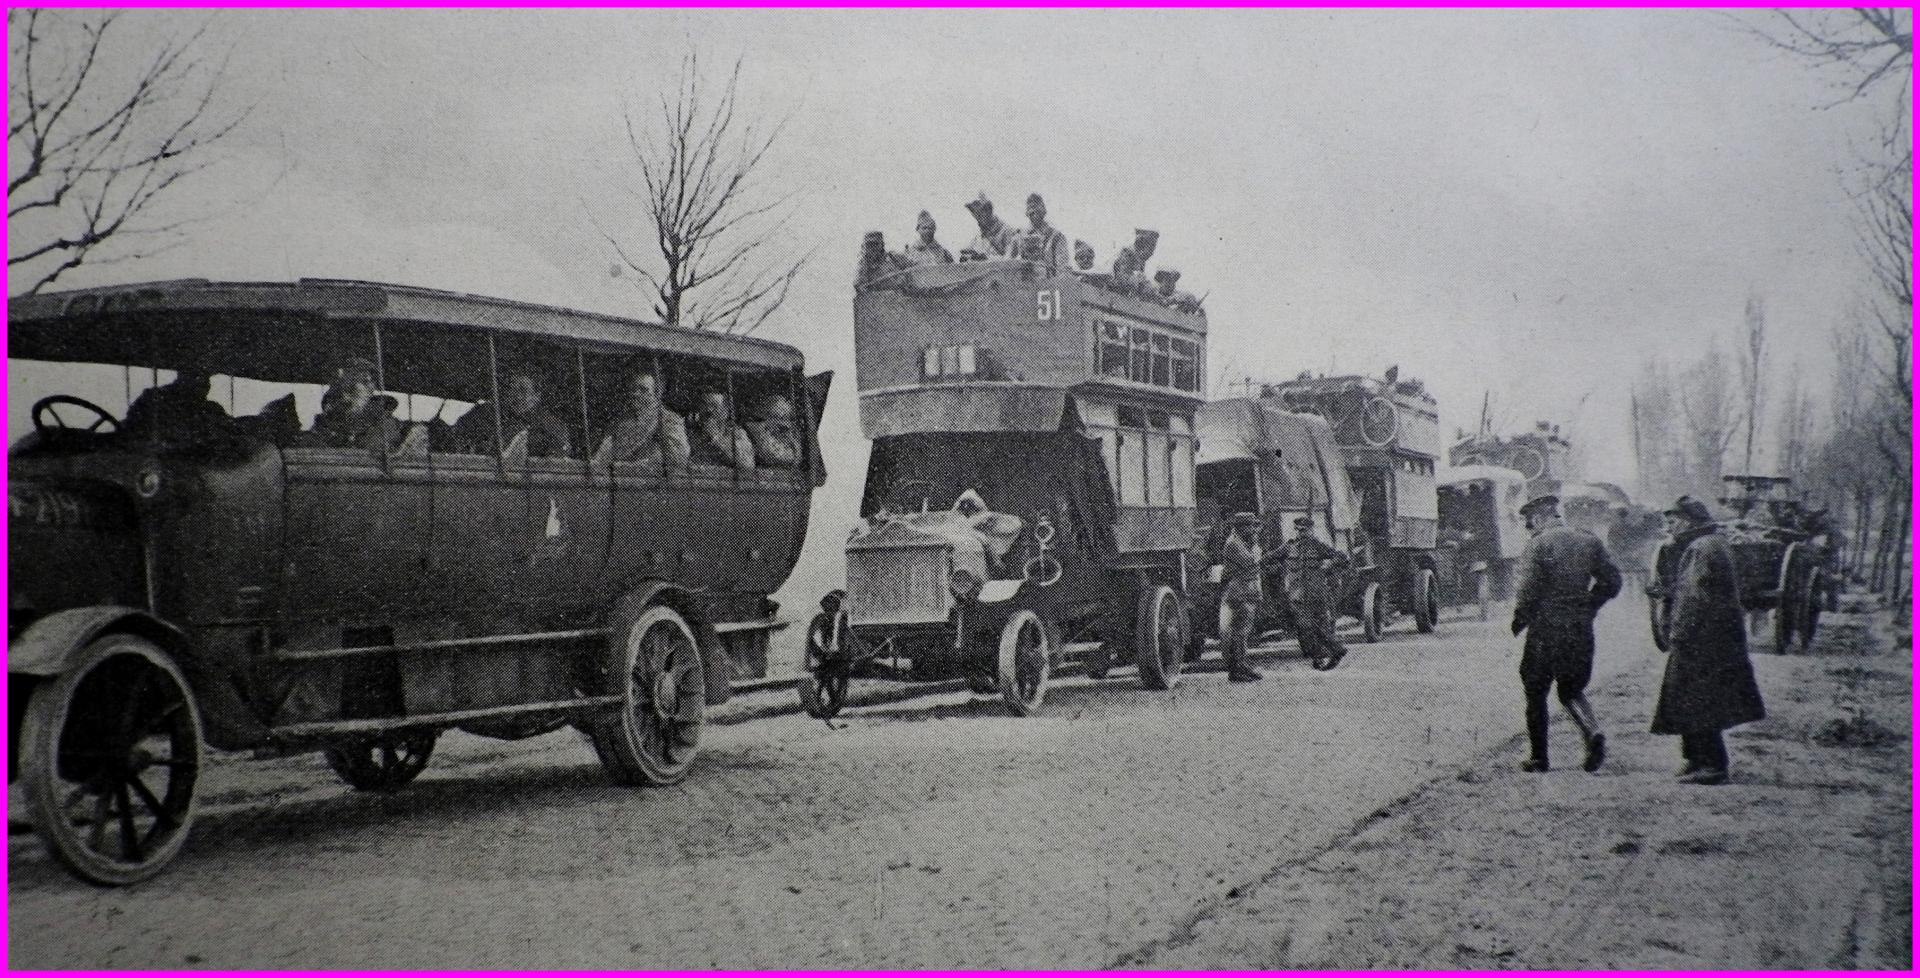 Calais 14 18 camions anglais amenant des troupes francaises en repos a calais encadre